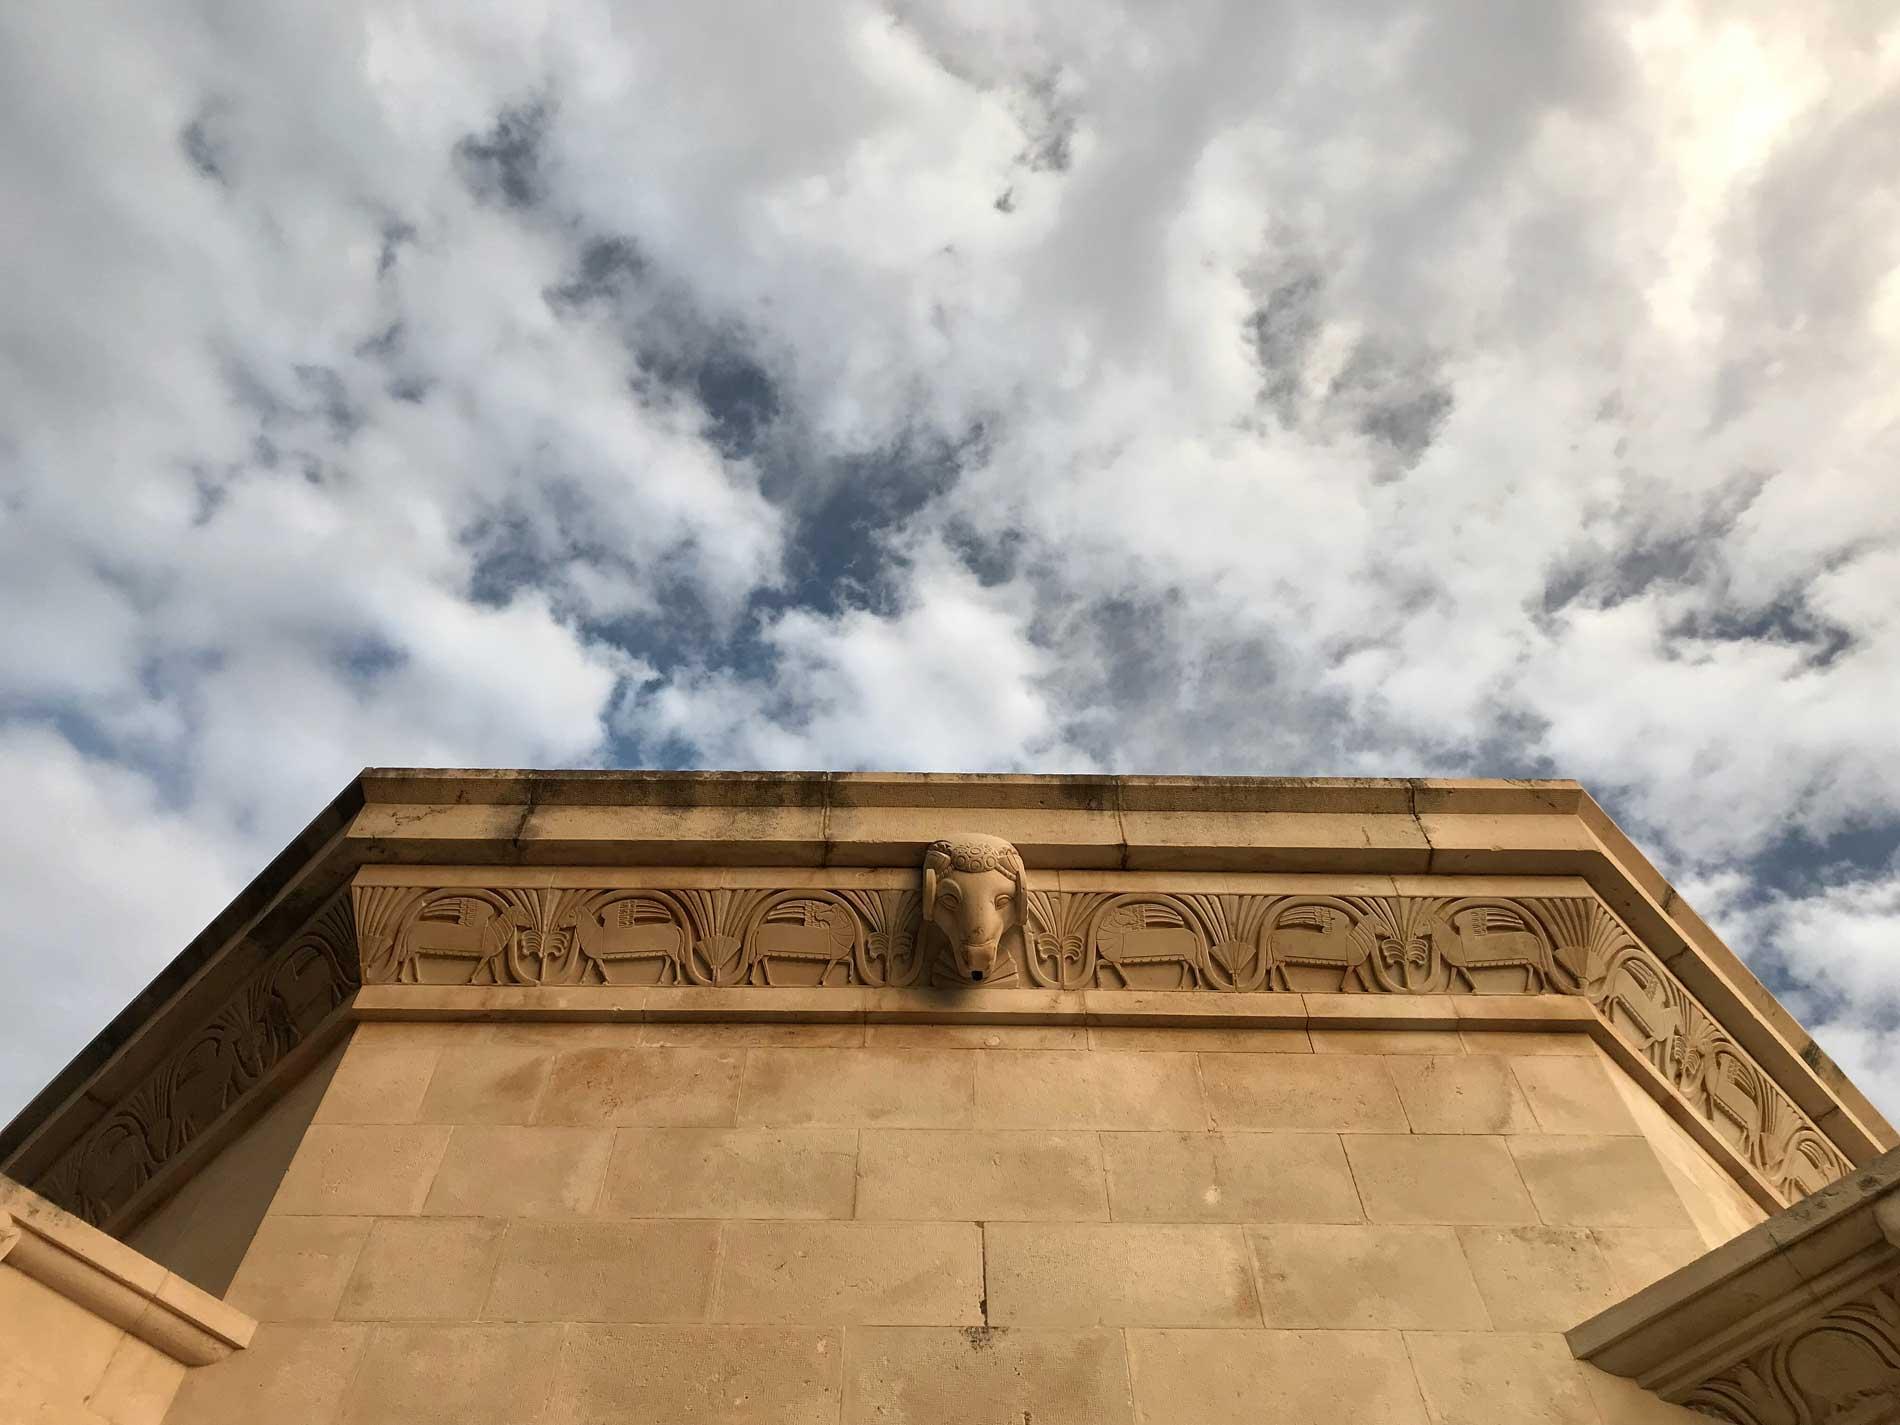 Cavtat-Dubrovnik-Croazia-Mausoleo-Racic-Ivan-Mestrovic-dettaglio